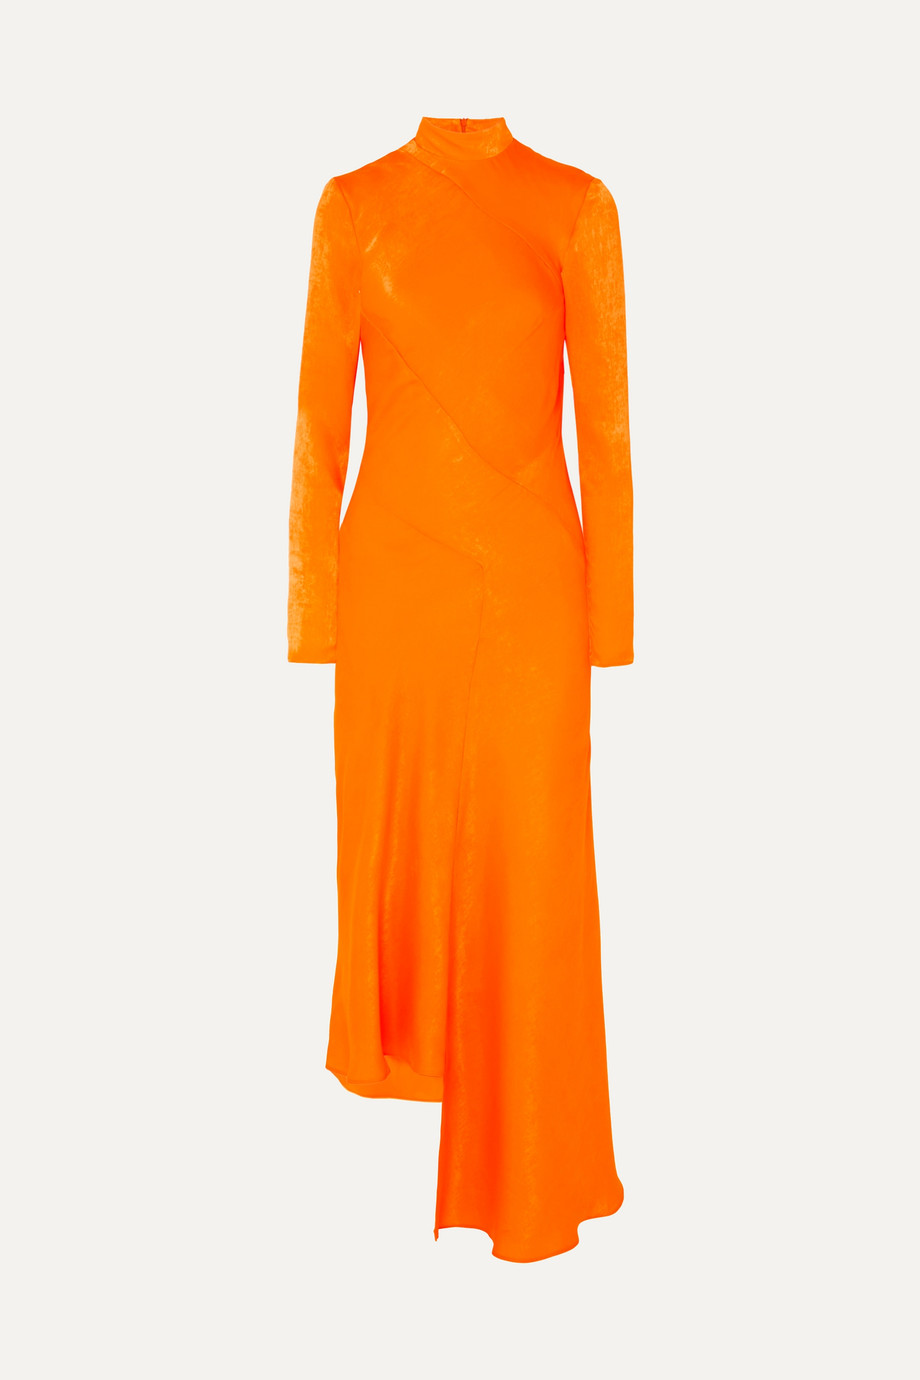 House of Holland Asymmetric hammered-satin dress